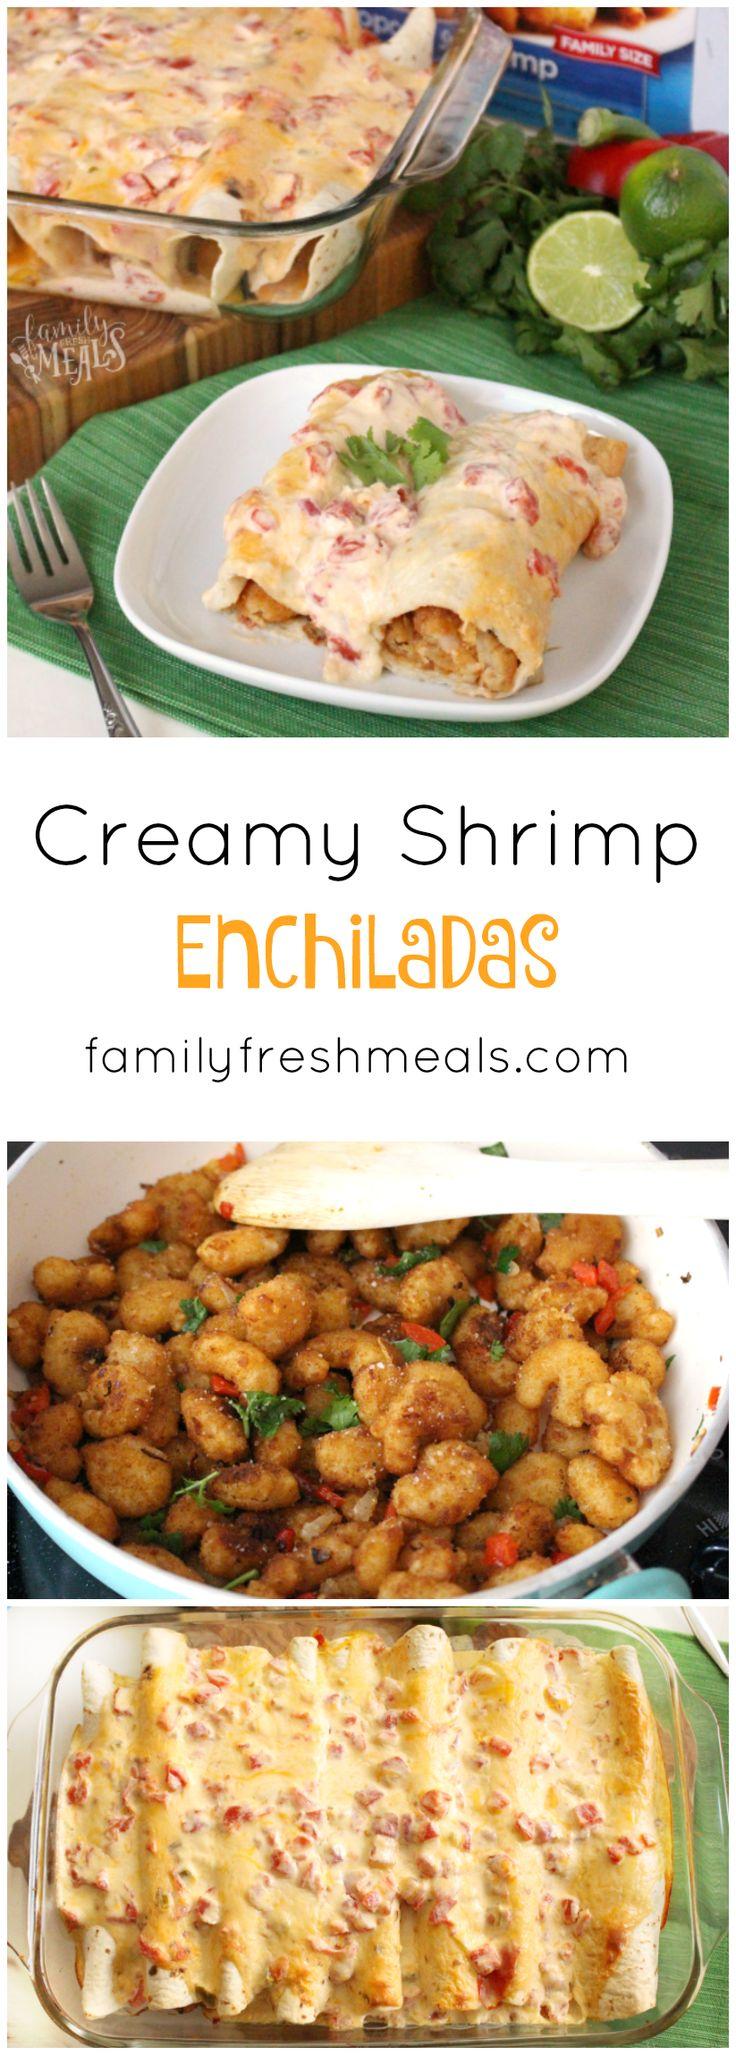 Creamy Shrimp Enchiladas recipe. SO EASY to make and my family LOVES these!